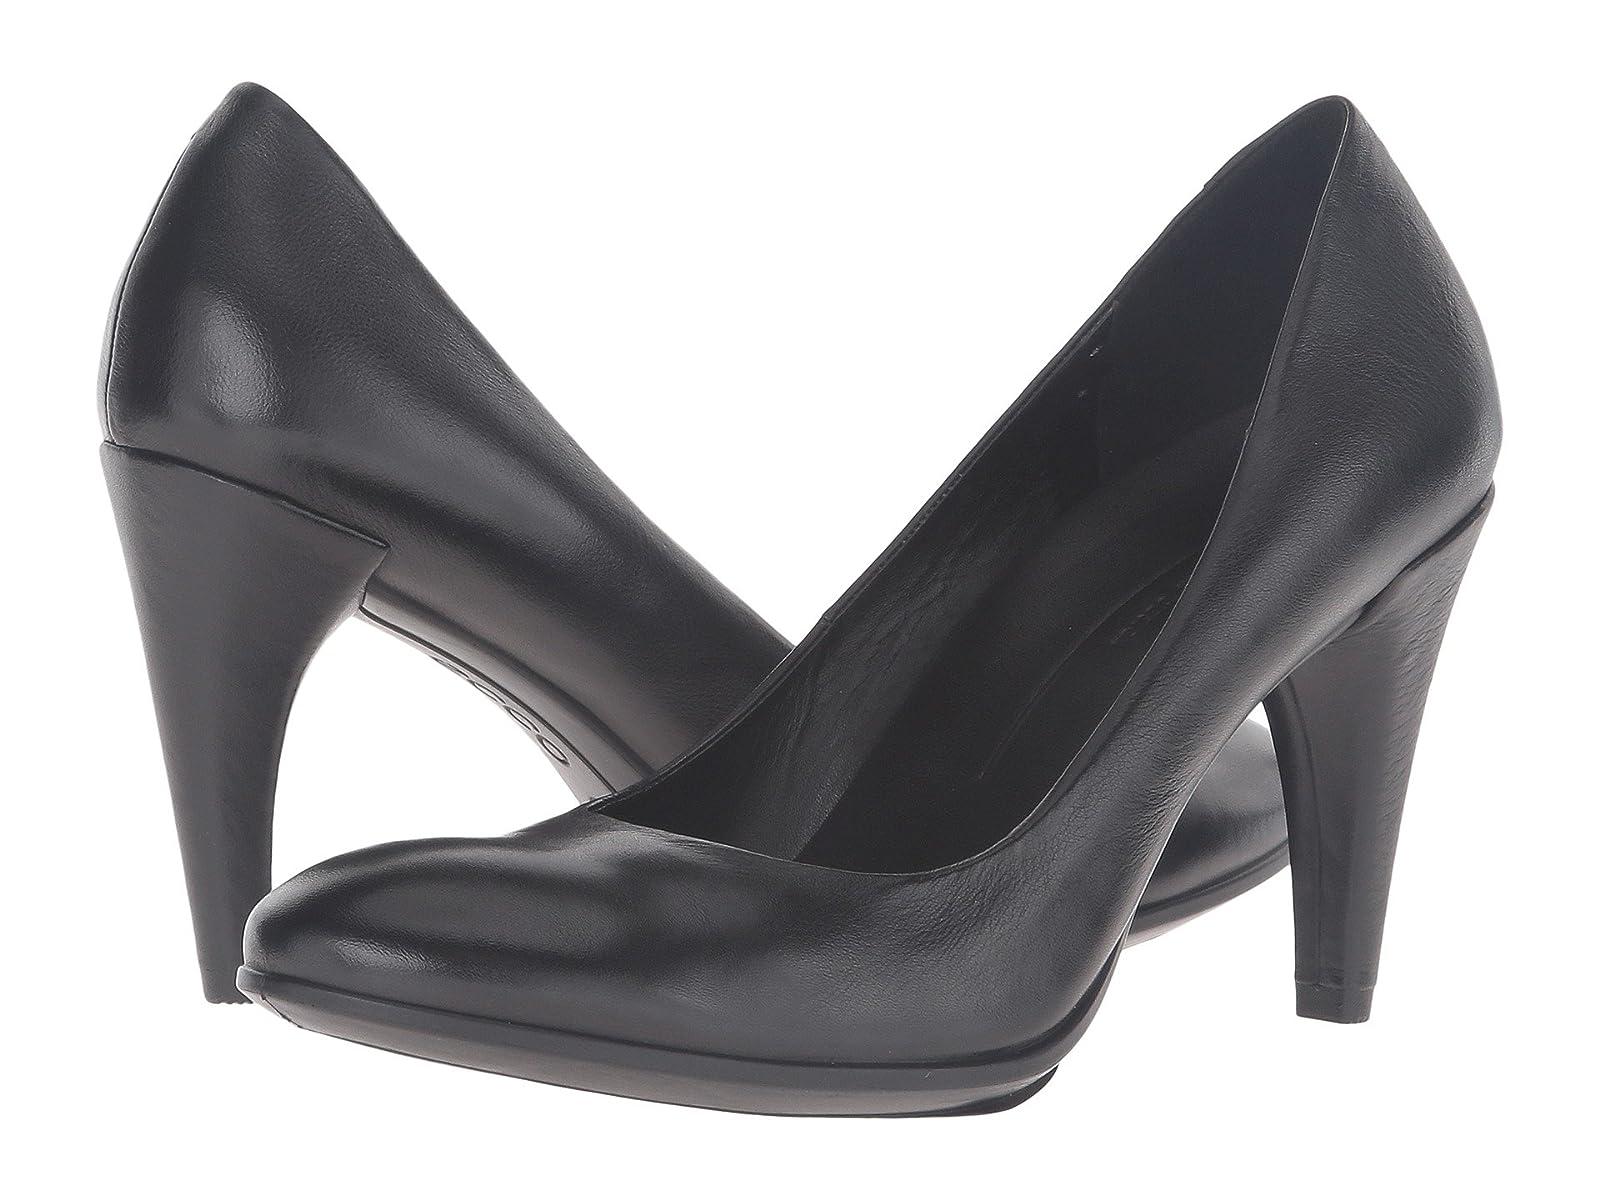 ECCO Shape 75 Sleek PumpCheap and distinctive eye-catching shoes